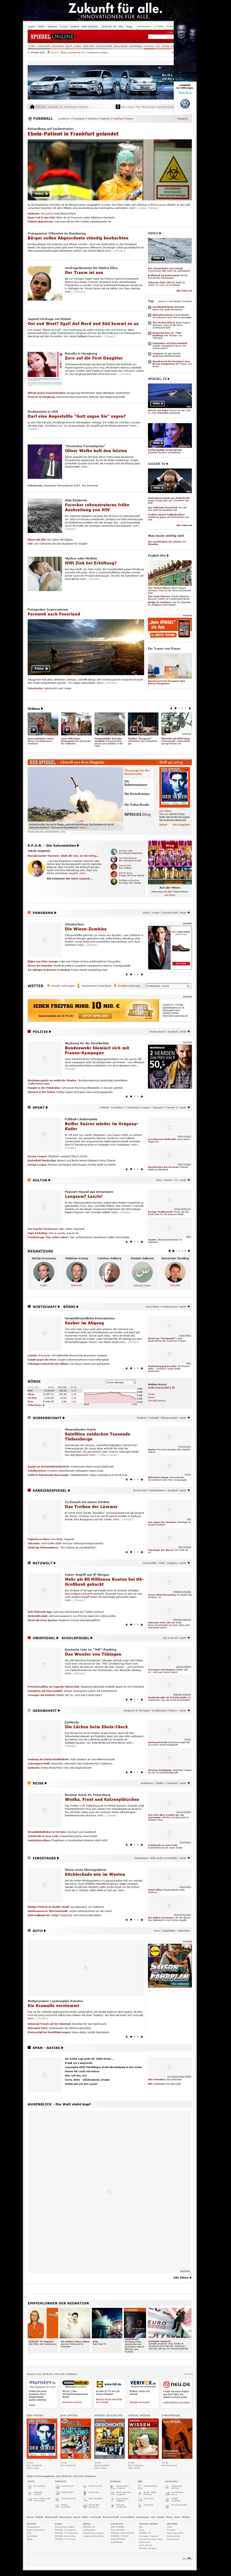 Spiegel Online at Friday Oct. 3, 2014, 8:14 a.m. UTC